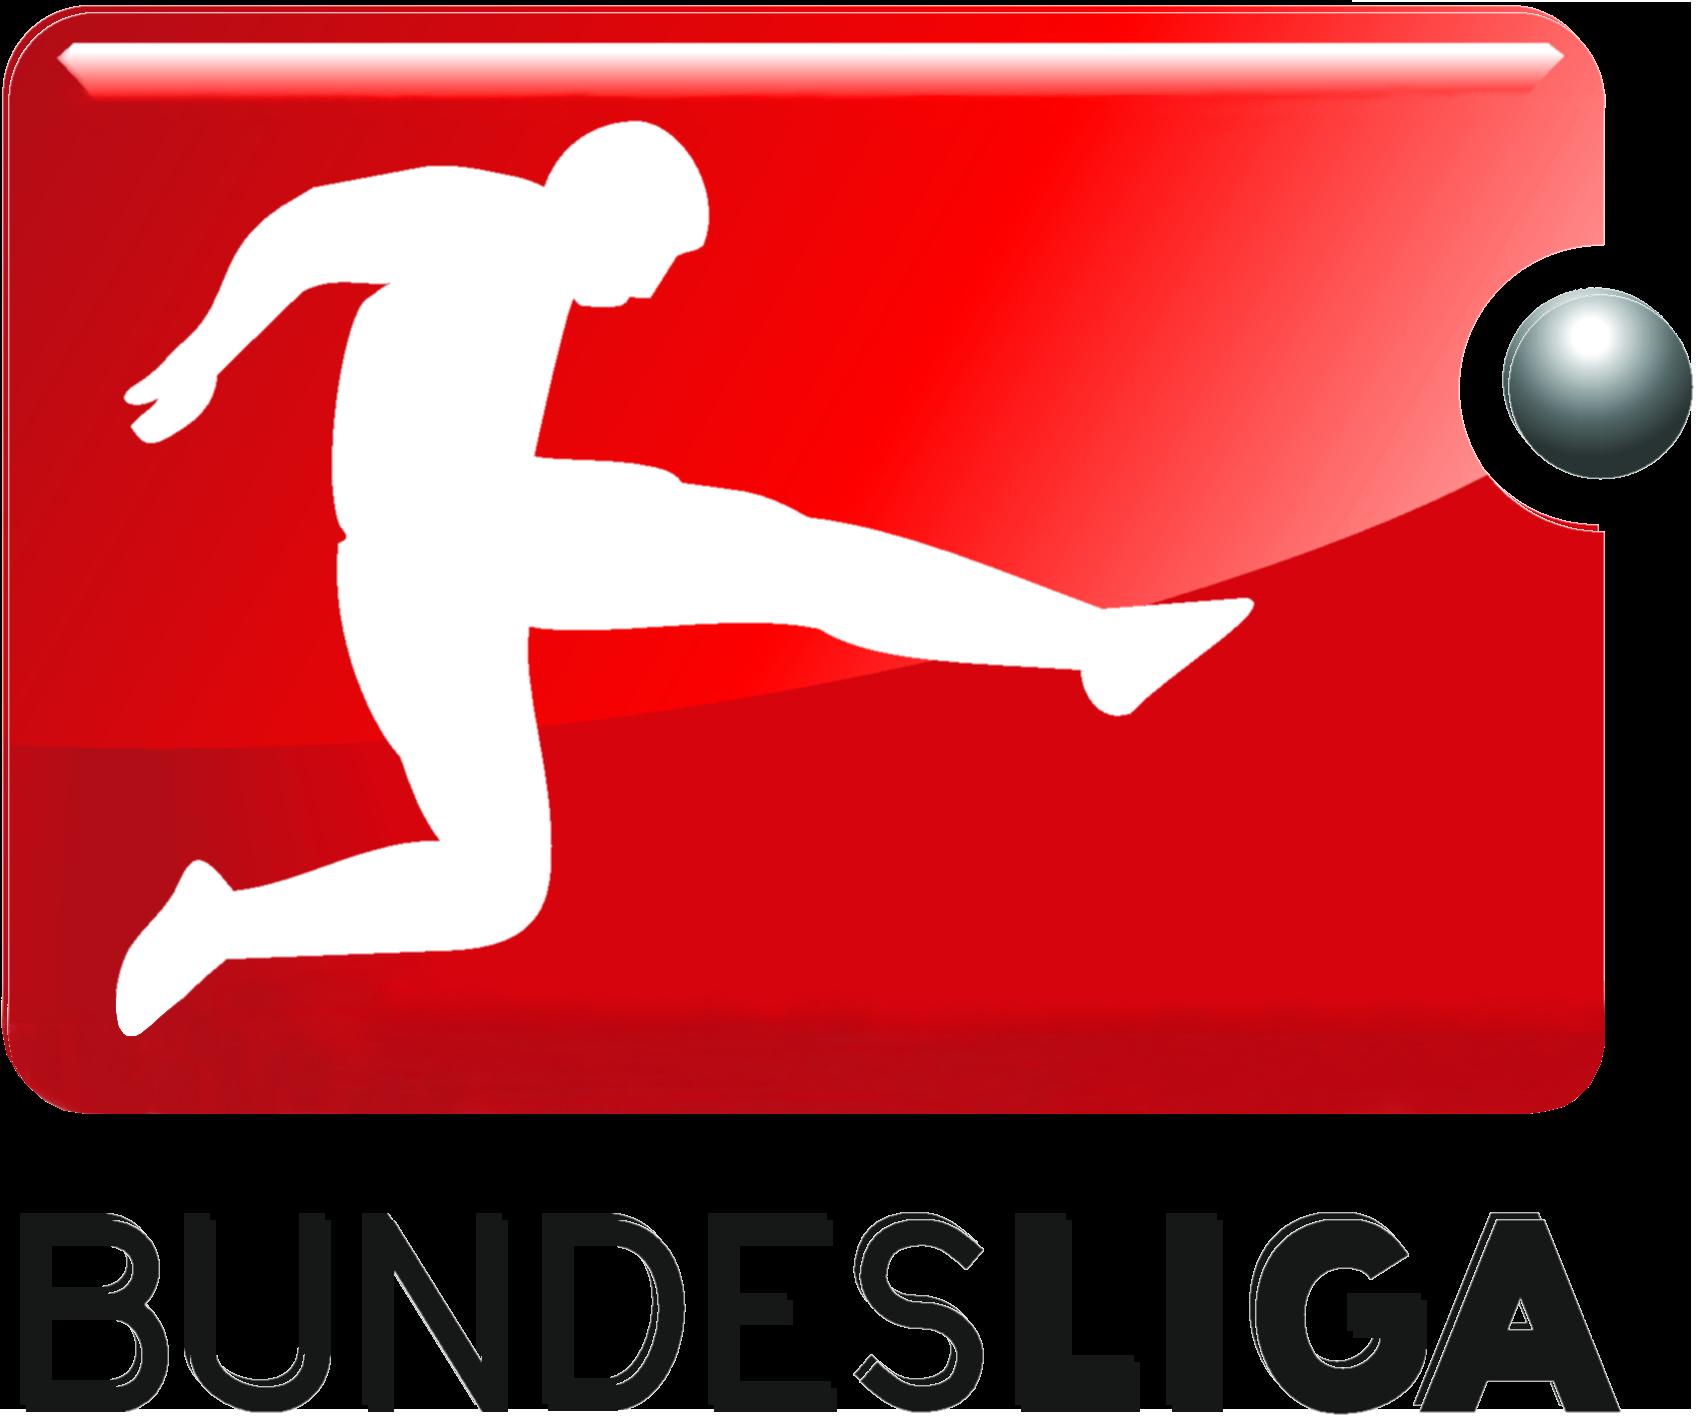 www.dritte bundesliga.de